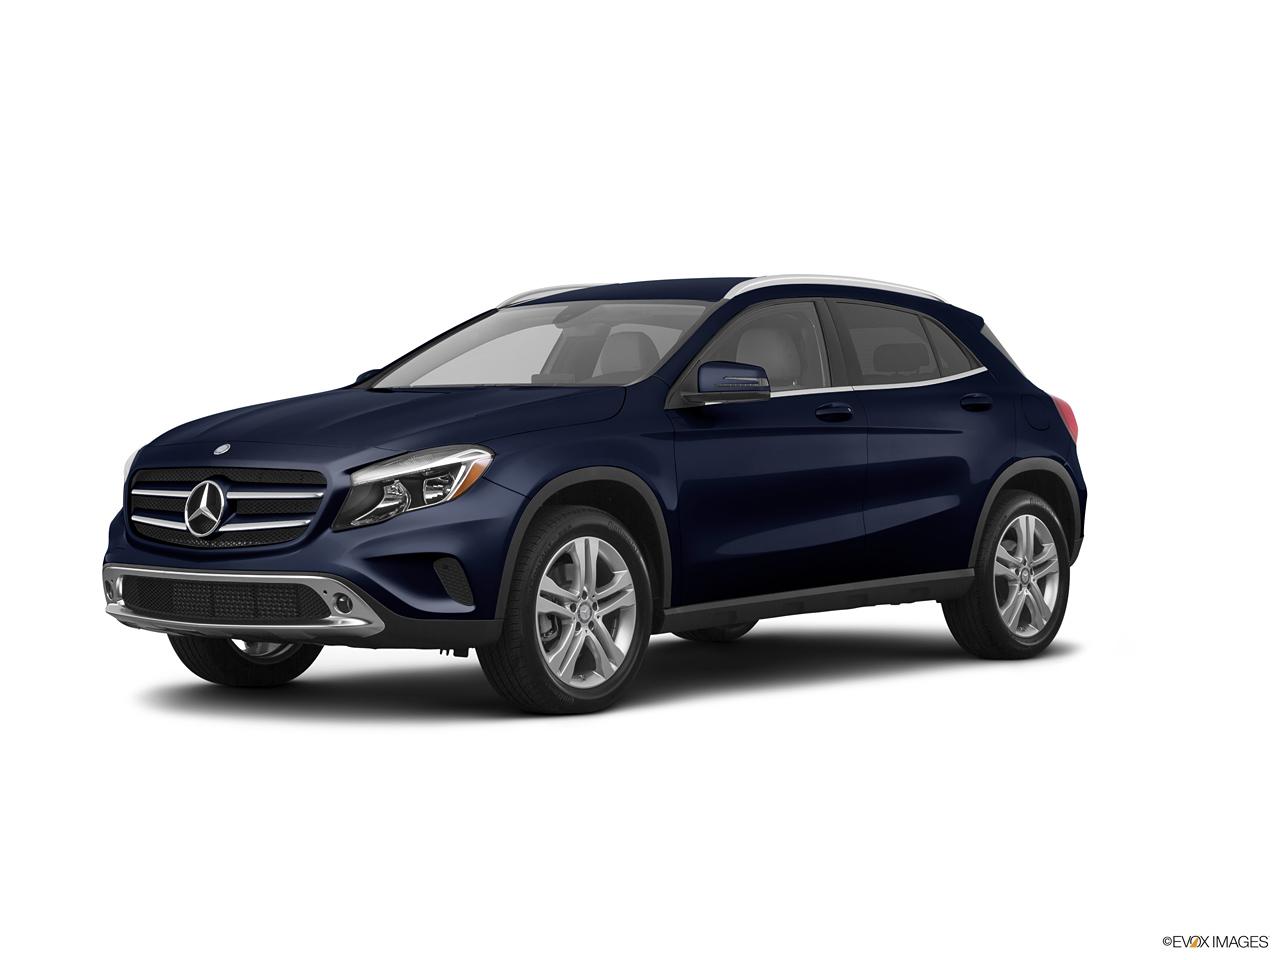 Mercedes benz gla 2017 45 amg in qatar new car prices for Mercedes benz gla prices